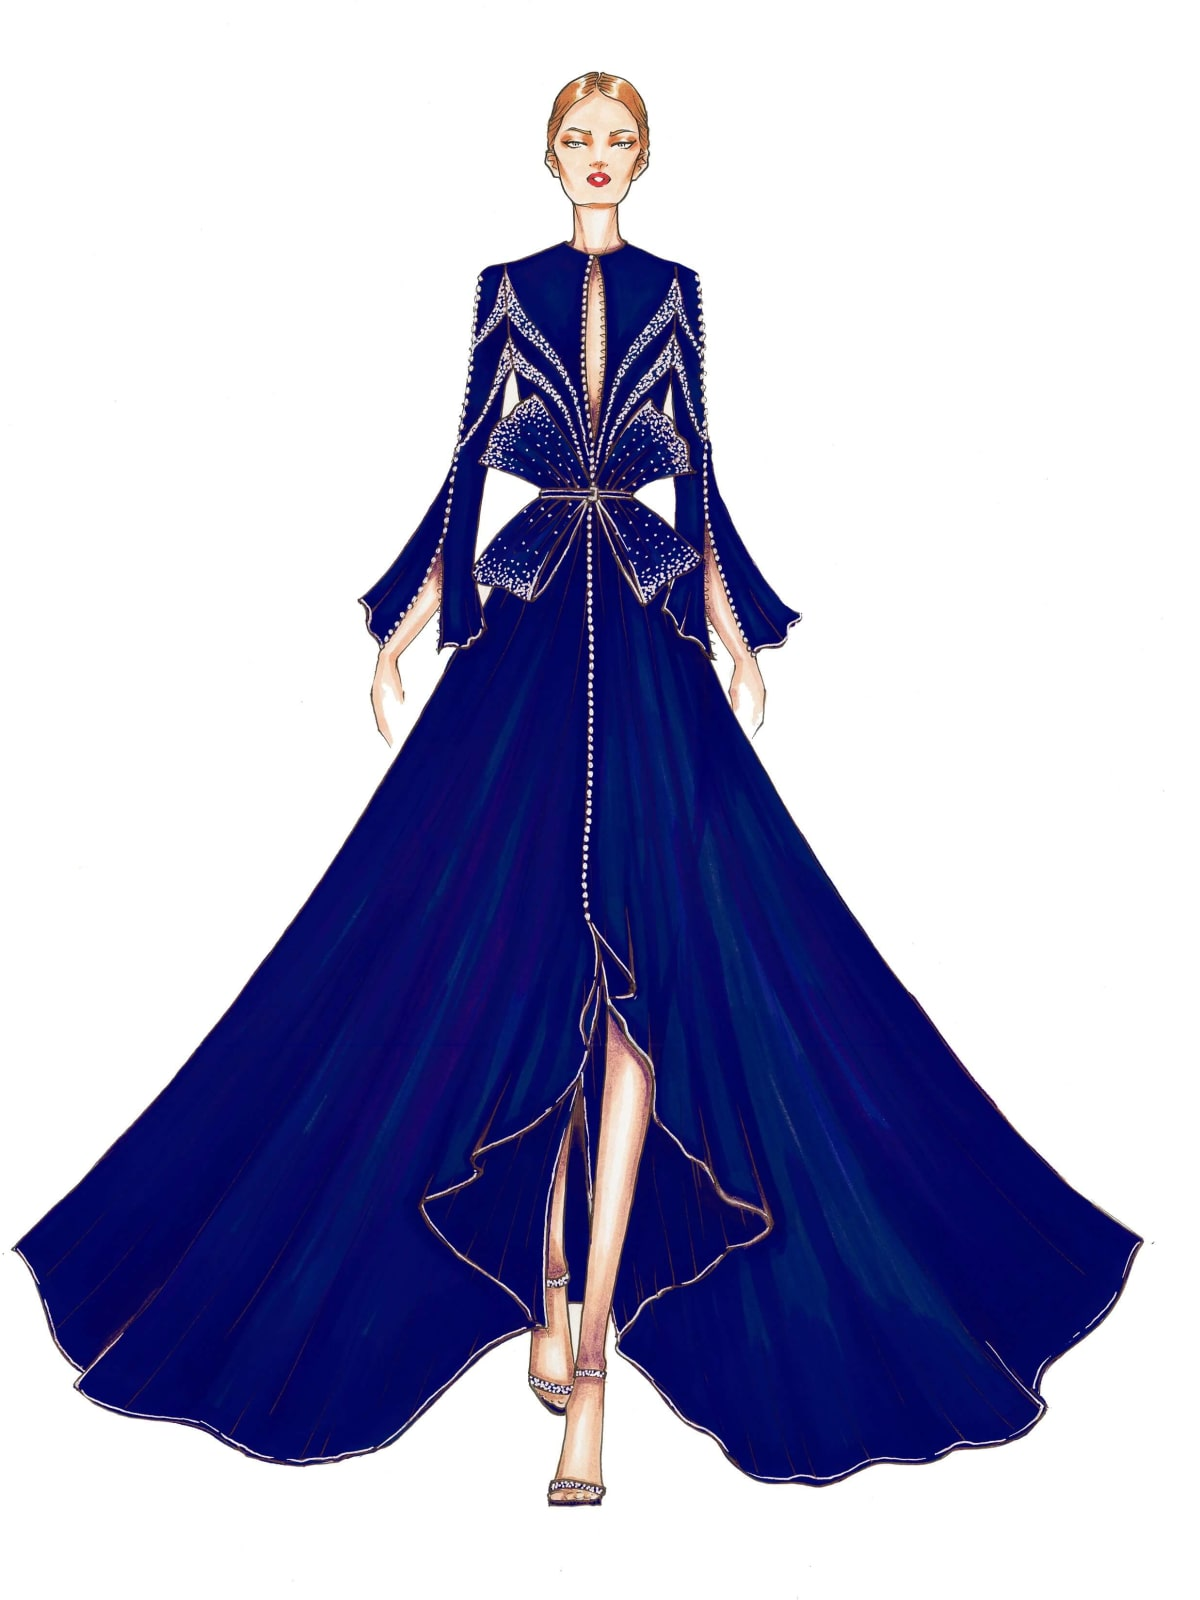 Oday Shakar designer inspiration sketch fall 2017